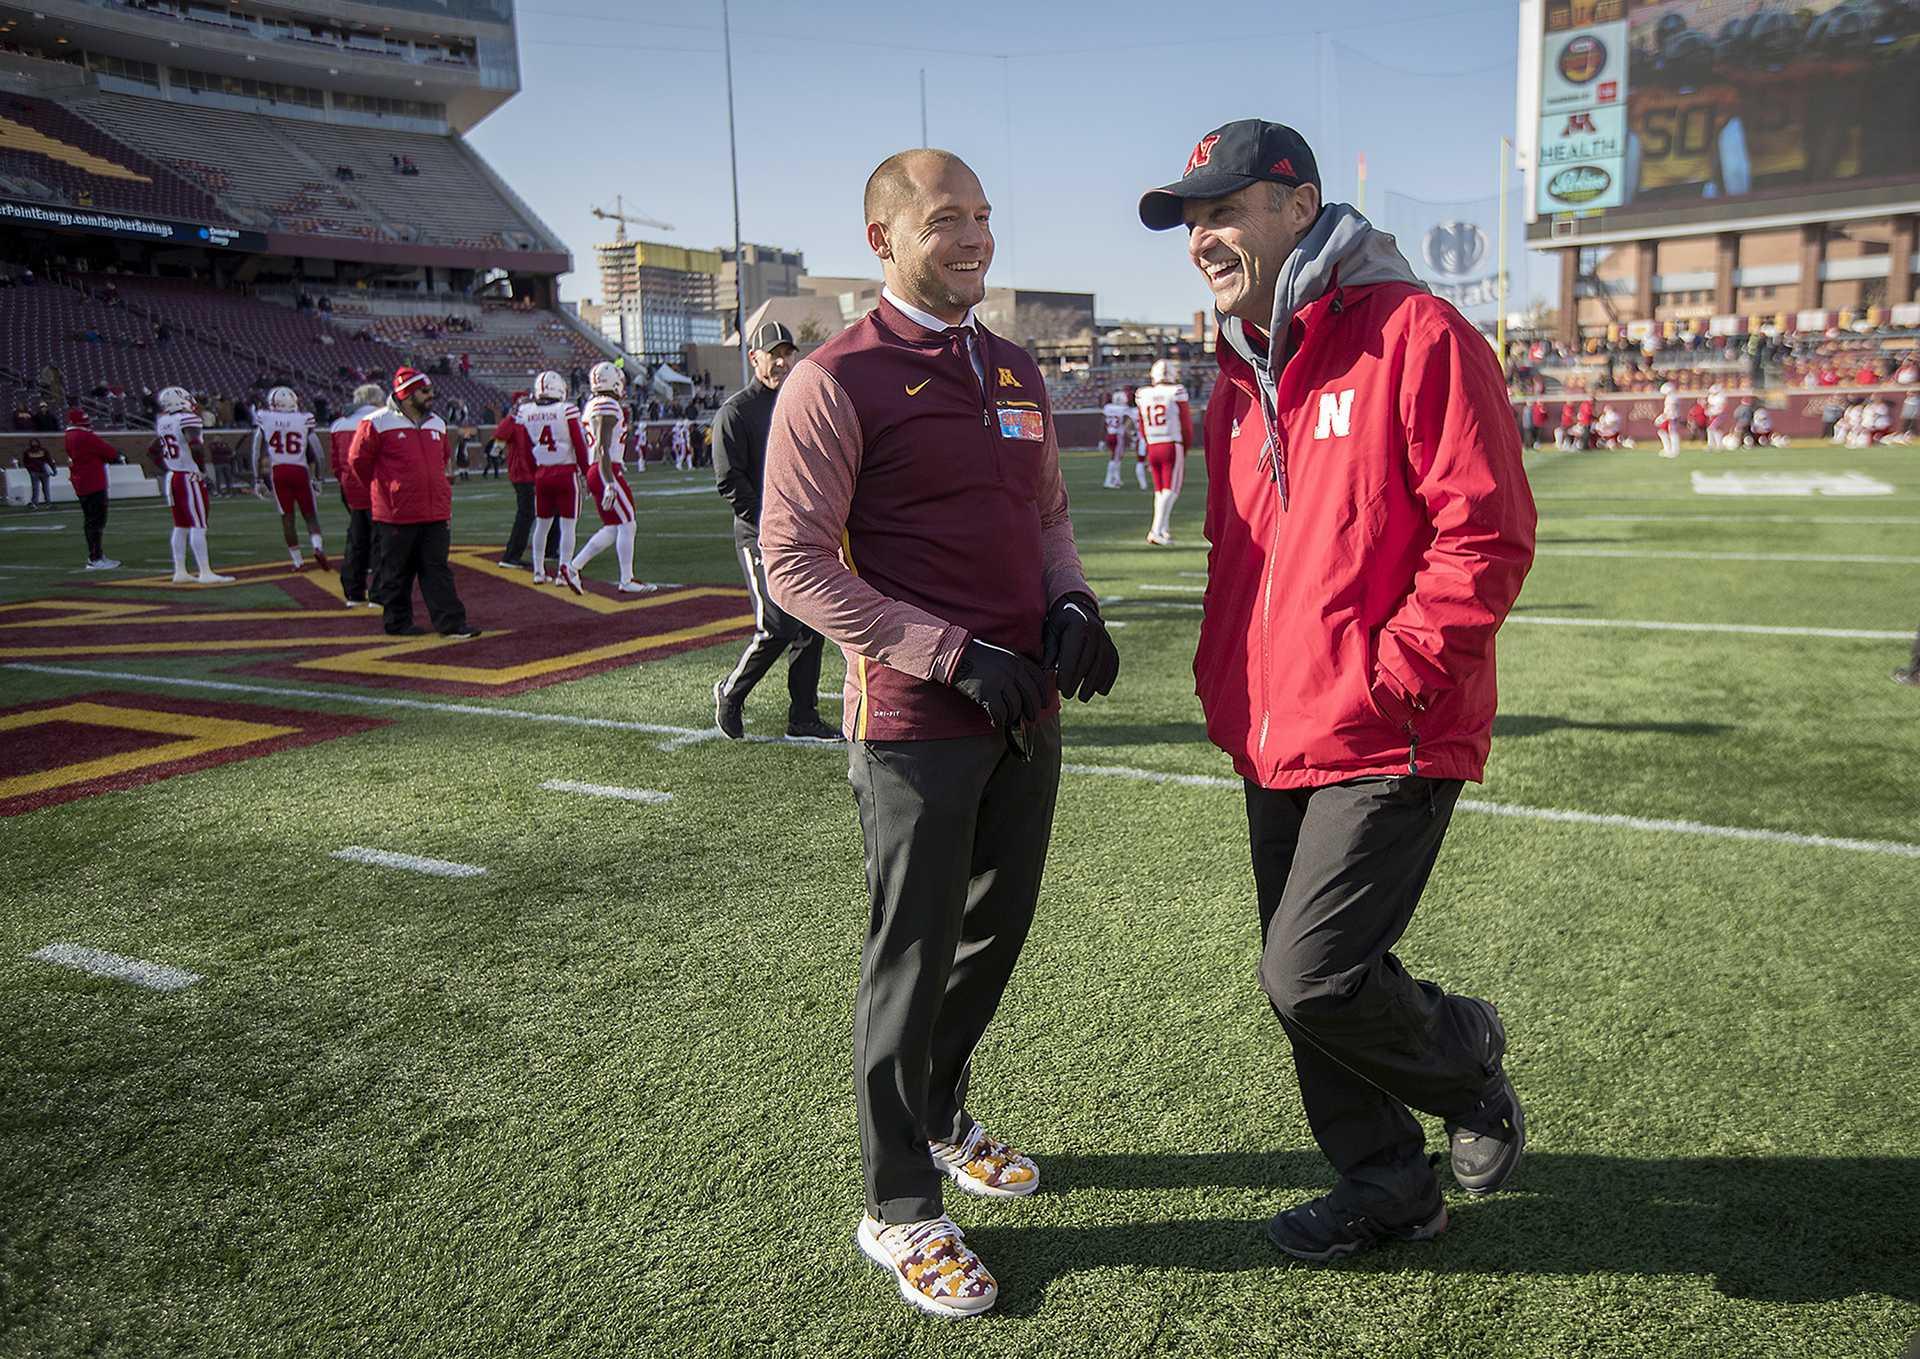 Minnesota head coach P. J. Fleck, right, and Nebraska head coach Mike Riley greet each other on the field before the Gophers took on Nebraska on Saturday, Nov. 11, 2017 at TCF Bank Stadium in Minneapolis, Minn. (Elizabeth Flores/Minneapolis Star Tribune/TNS)